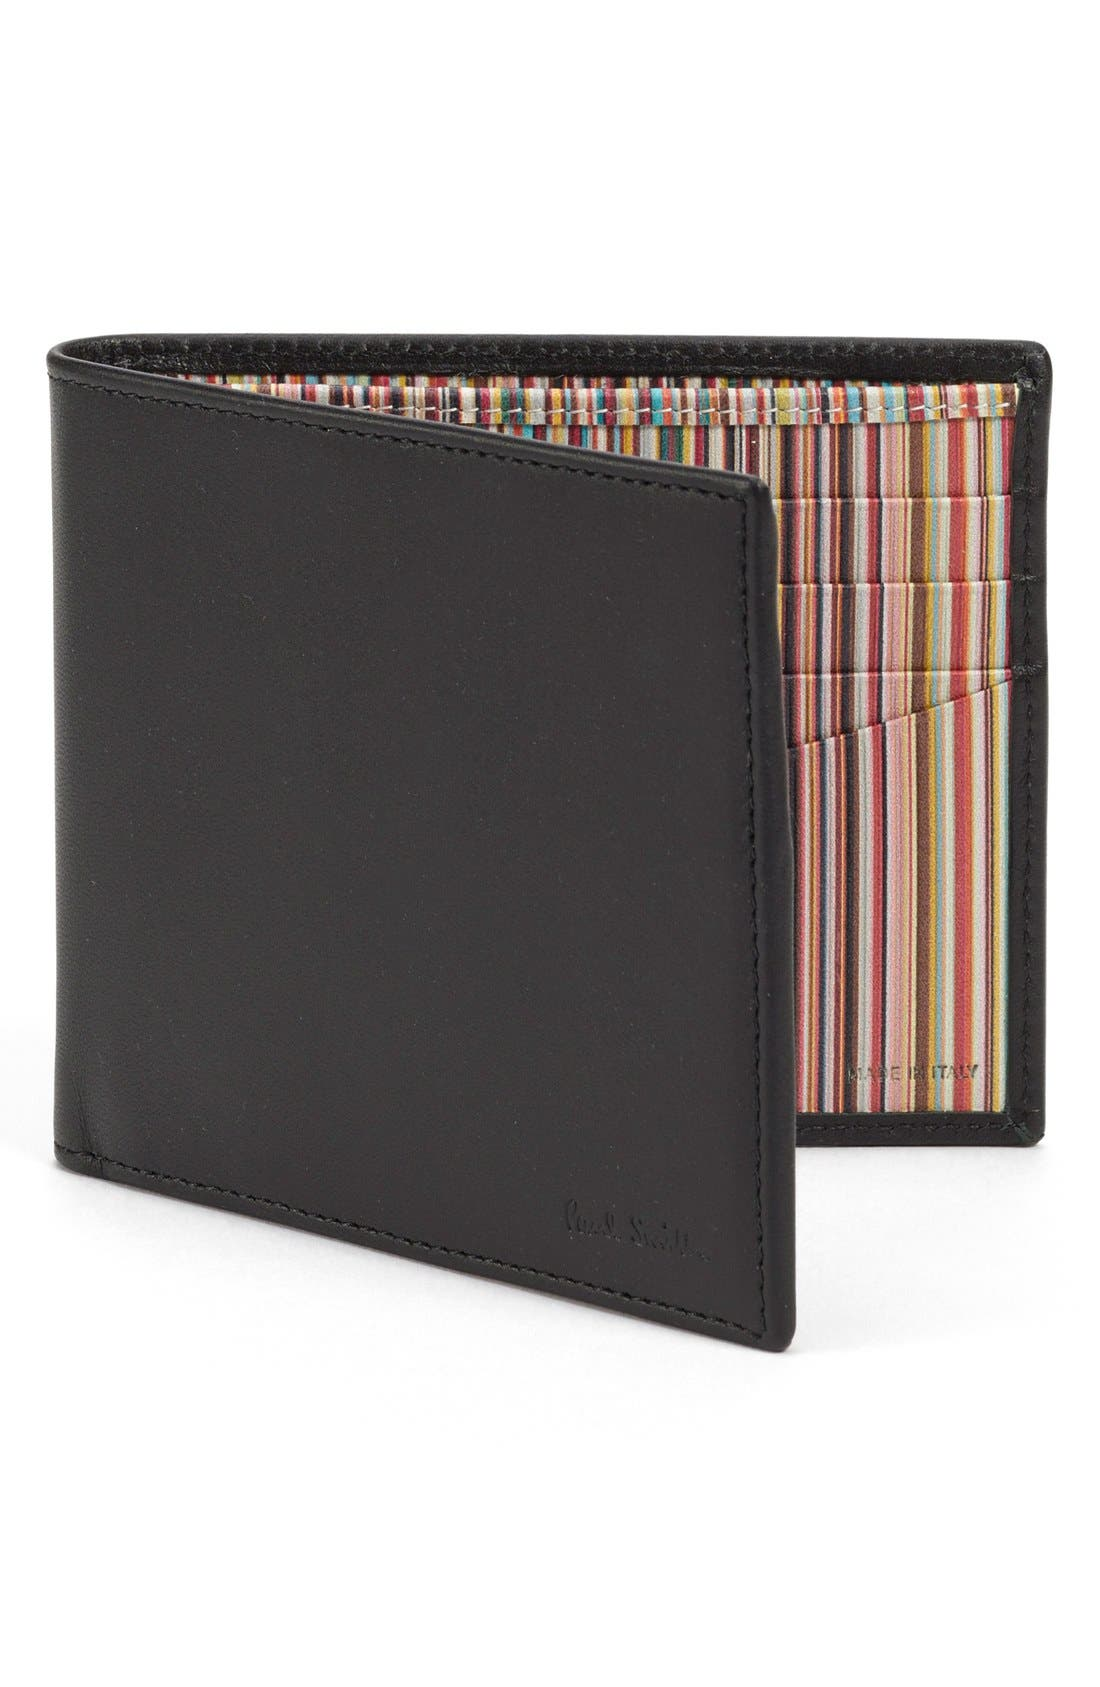 Interior Stripe Leather Billfold,                             Main thumbnail 1, color,                             Black